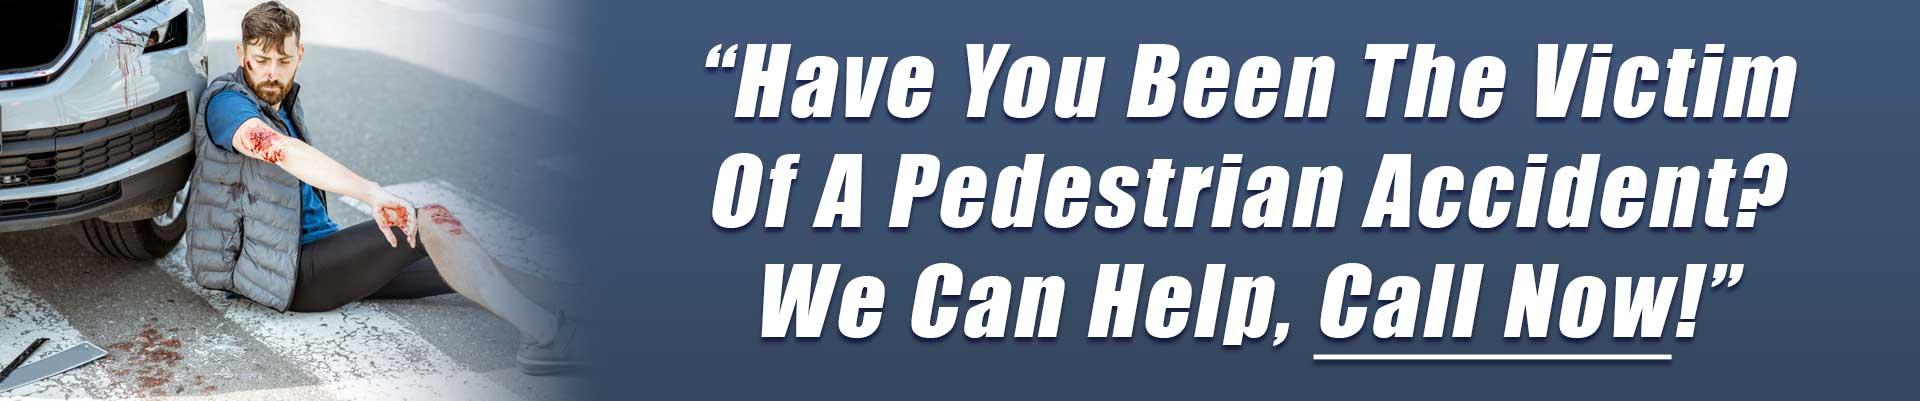 Phoenix Pedestrian Accident Lawyer